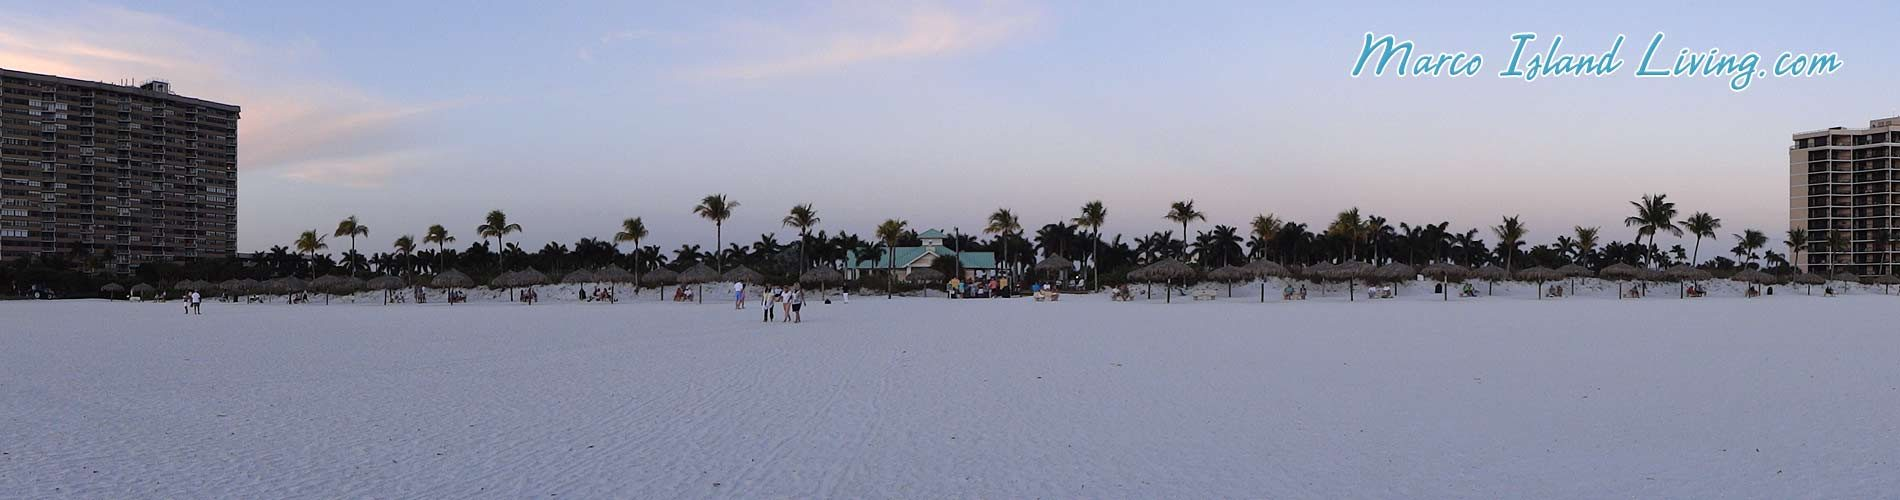 Florida Beach Vacations Gulf Coast Beaches on Marco Island Dining Nightclubs Boating Golf Resorts Vacation Rental Homes Beachfront Condos